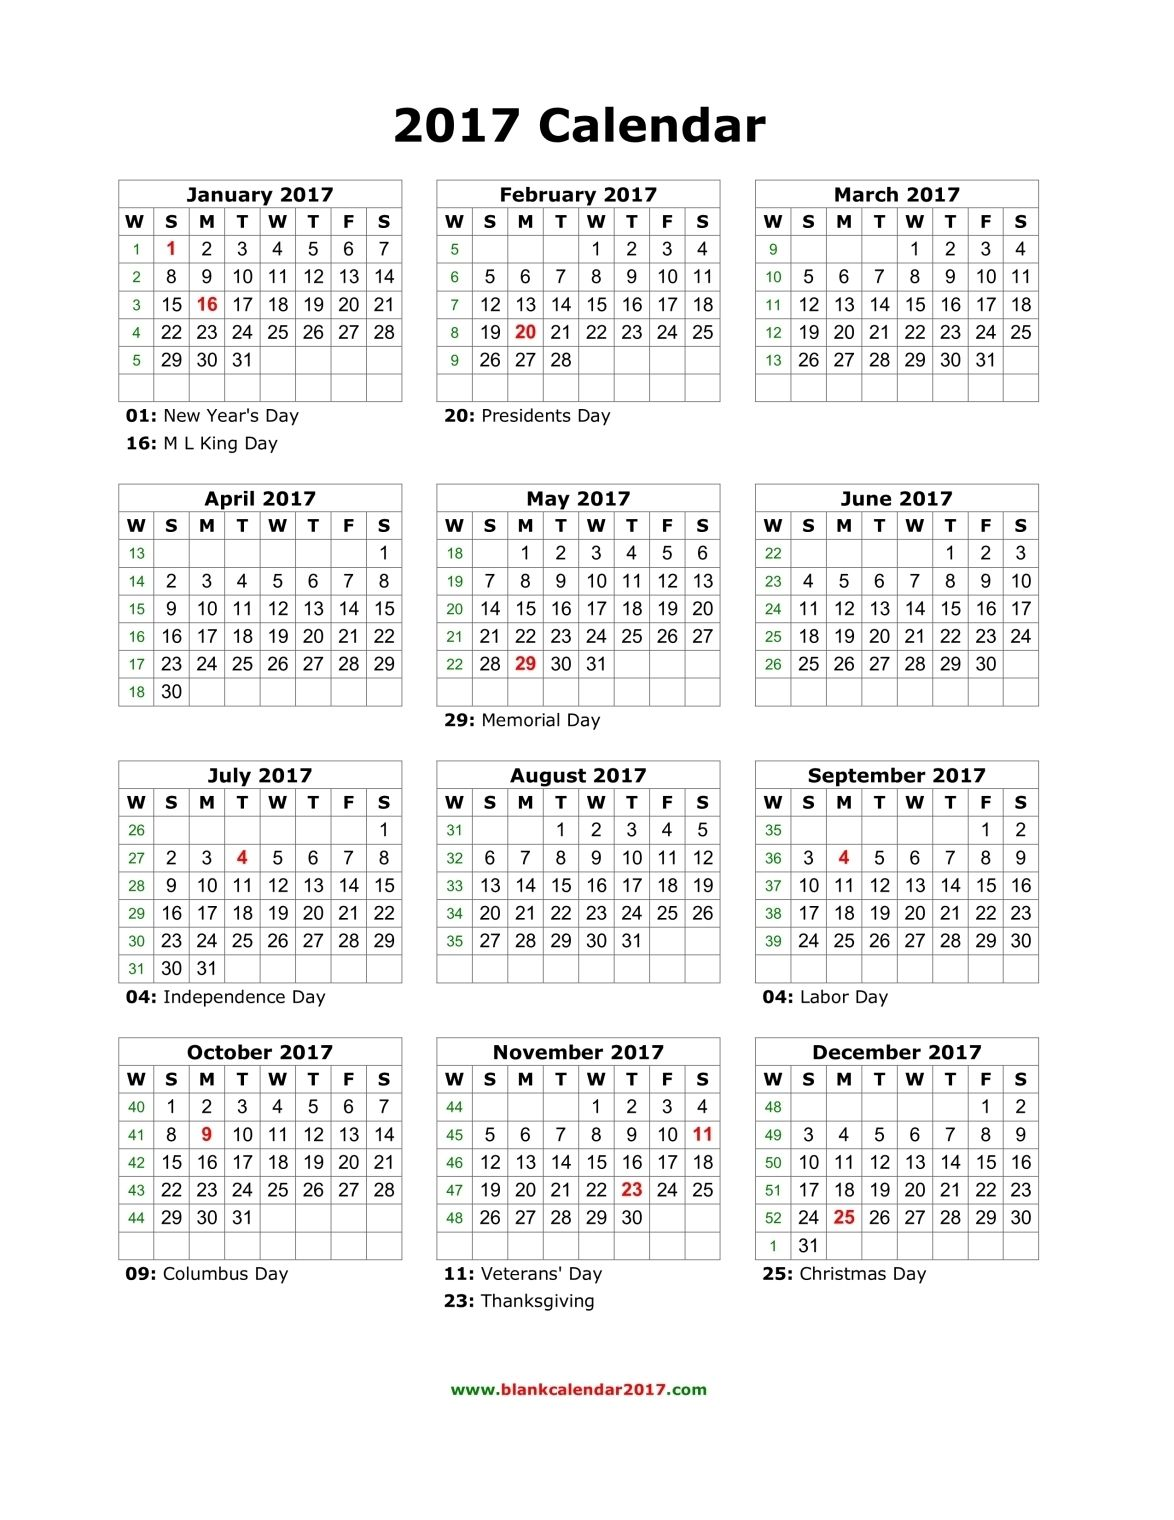 blank holidays calendar 2017 portrait print cut pinterest